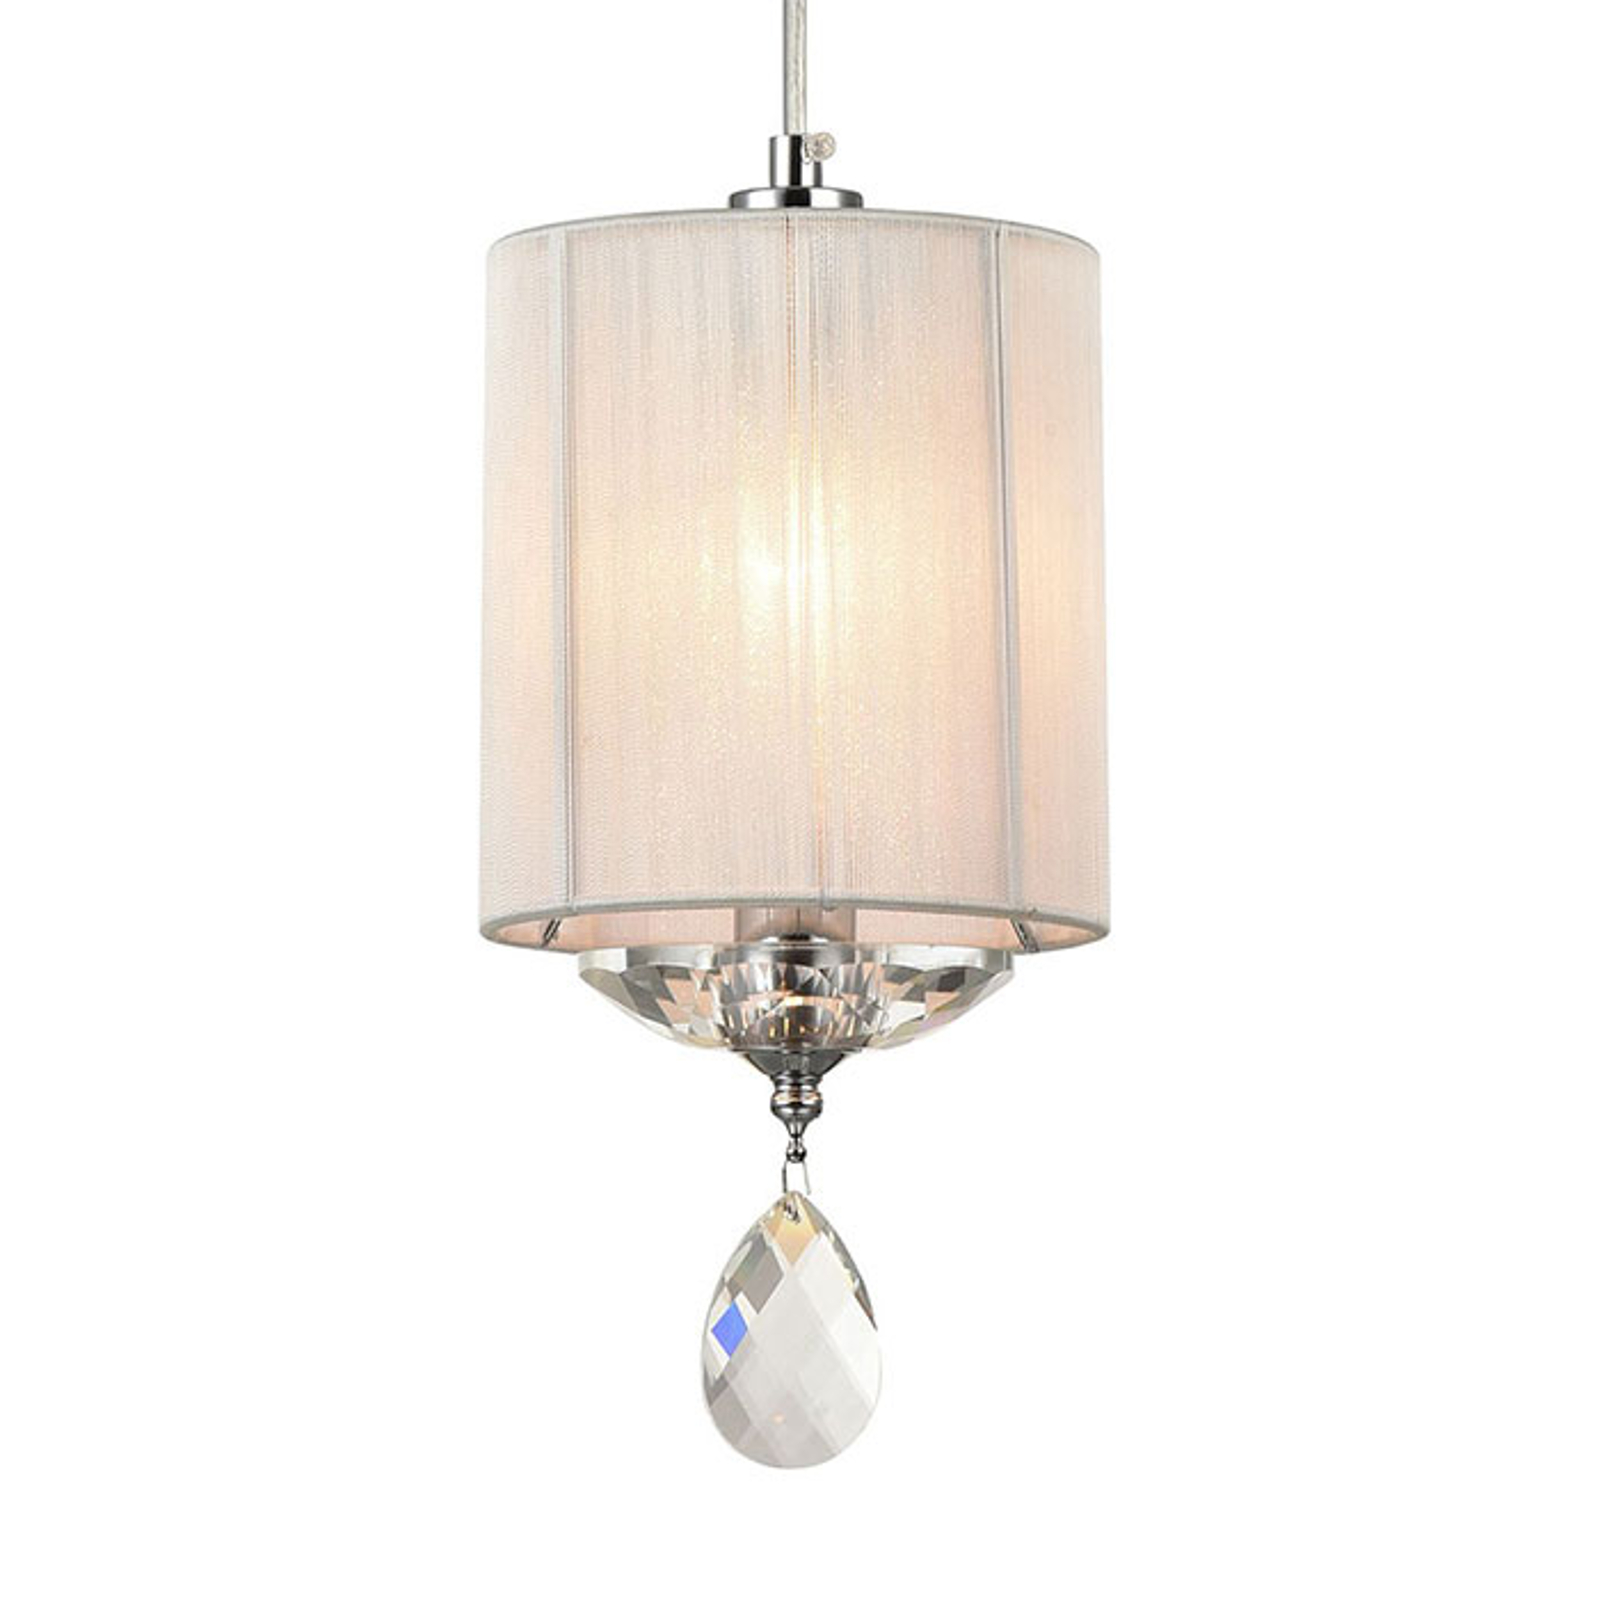 Hanglamp Miraggio